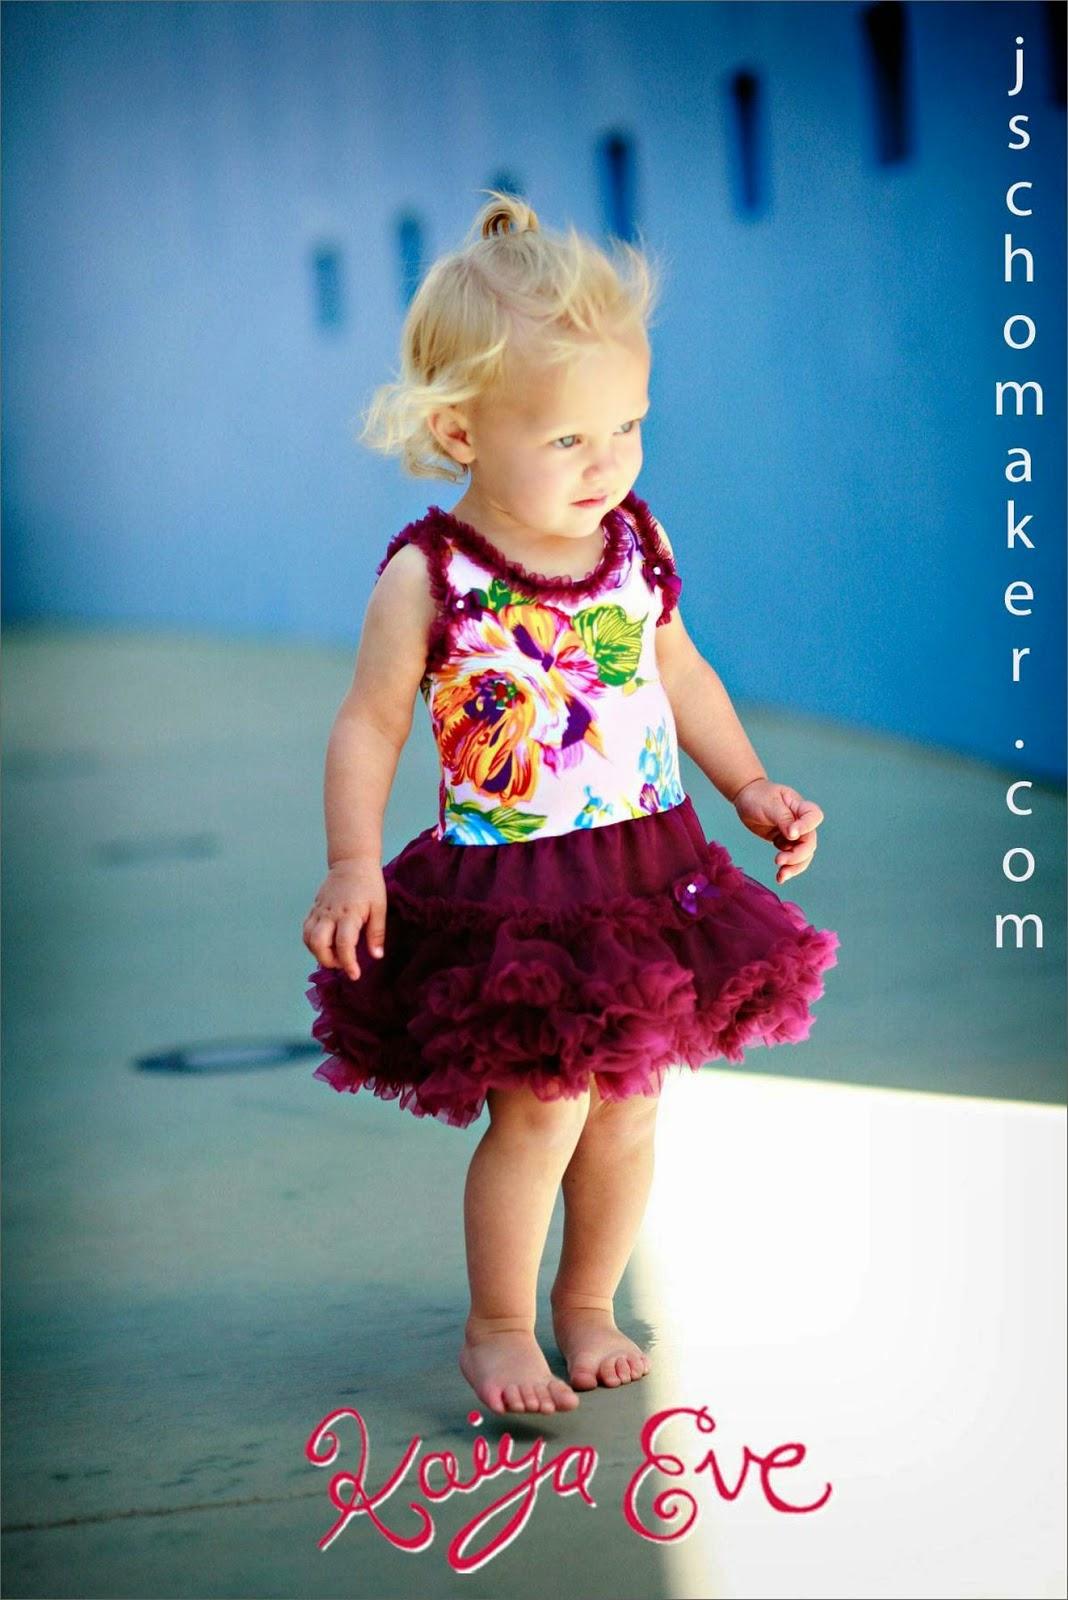 юбки-американки, или Petitskirt